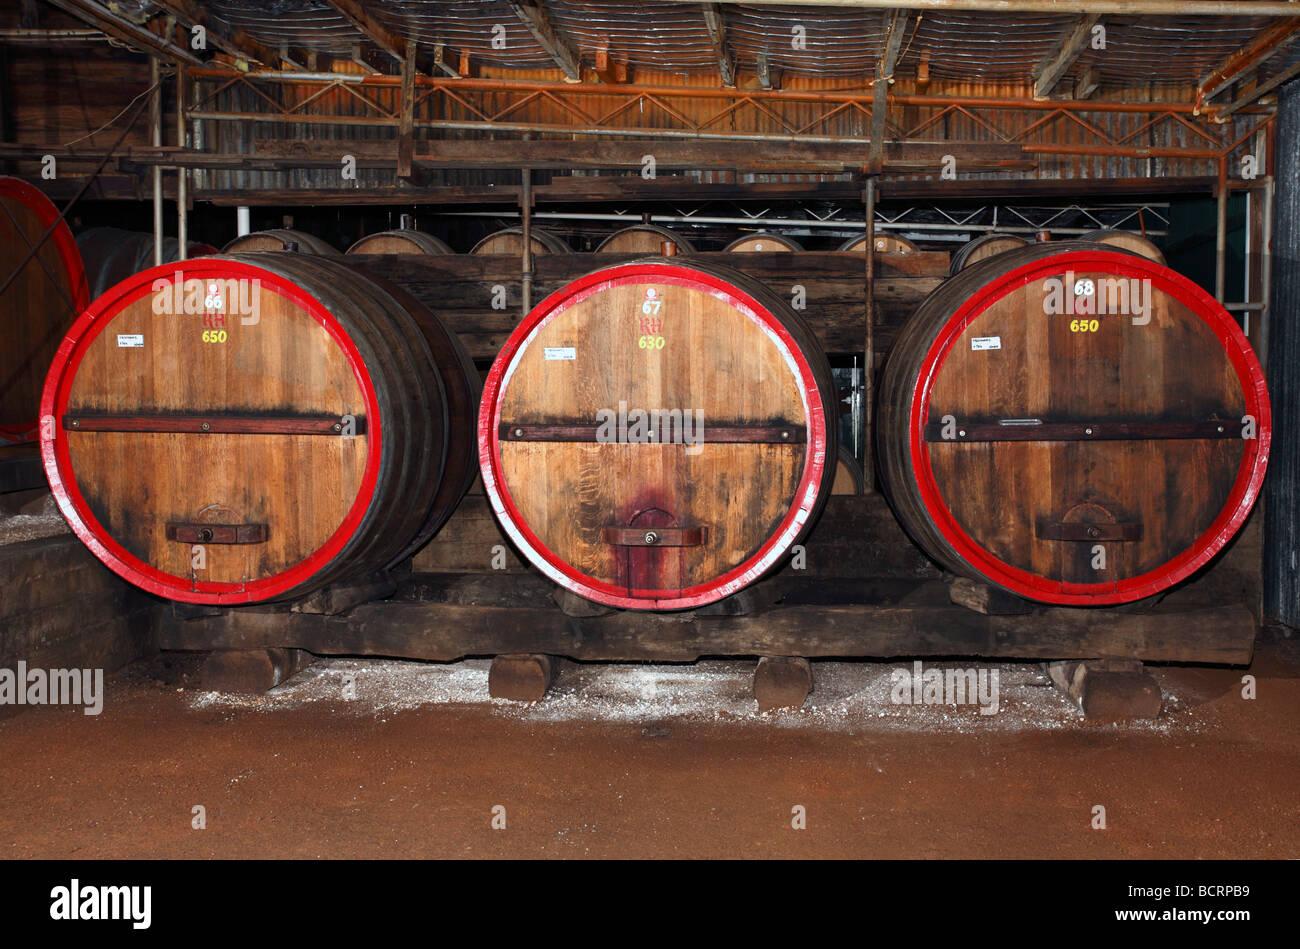 wine-cellar-at-tyrrells-winery-hunter-valley-australia-BCRPB9.jpg